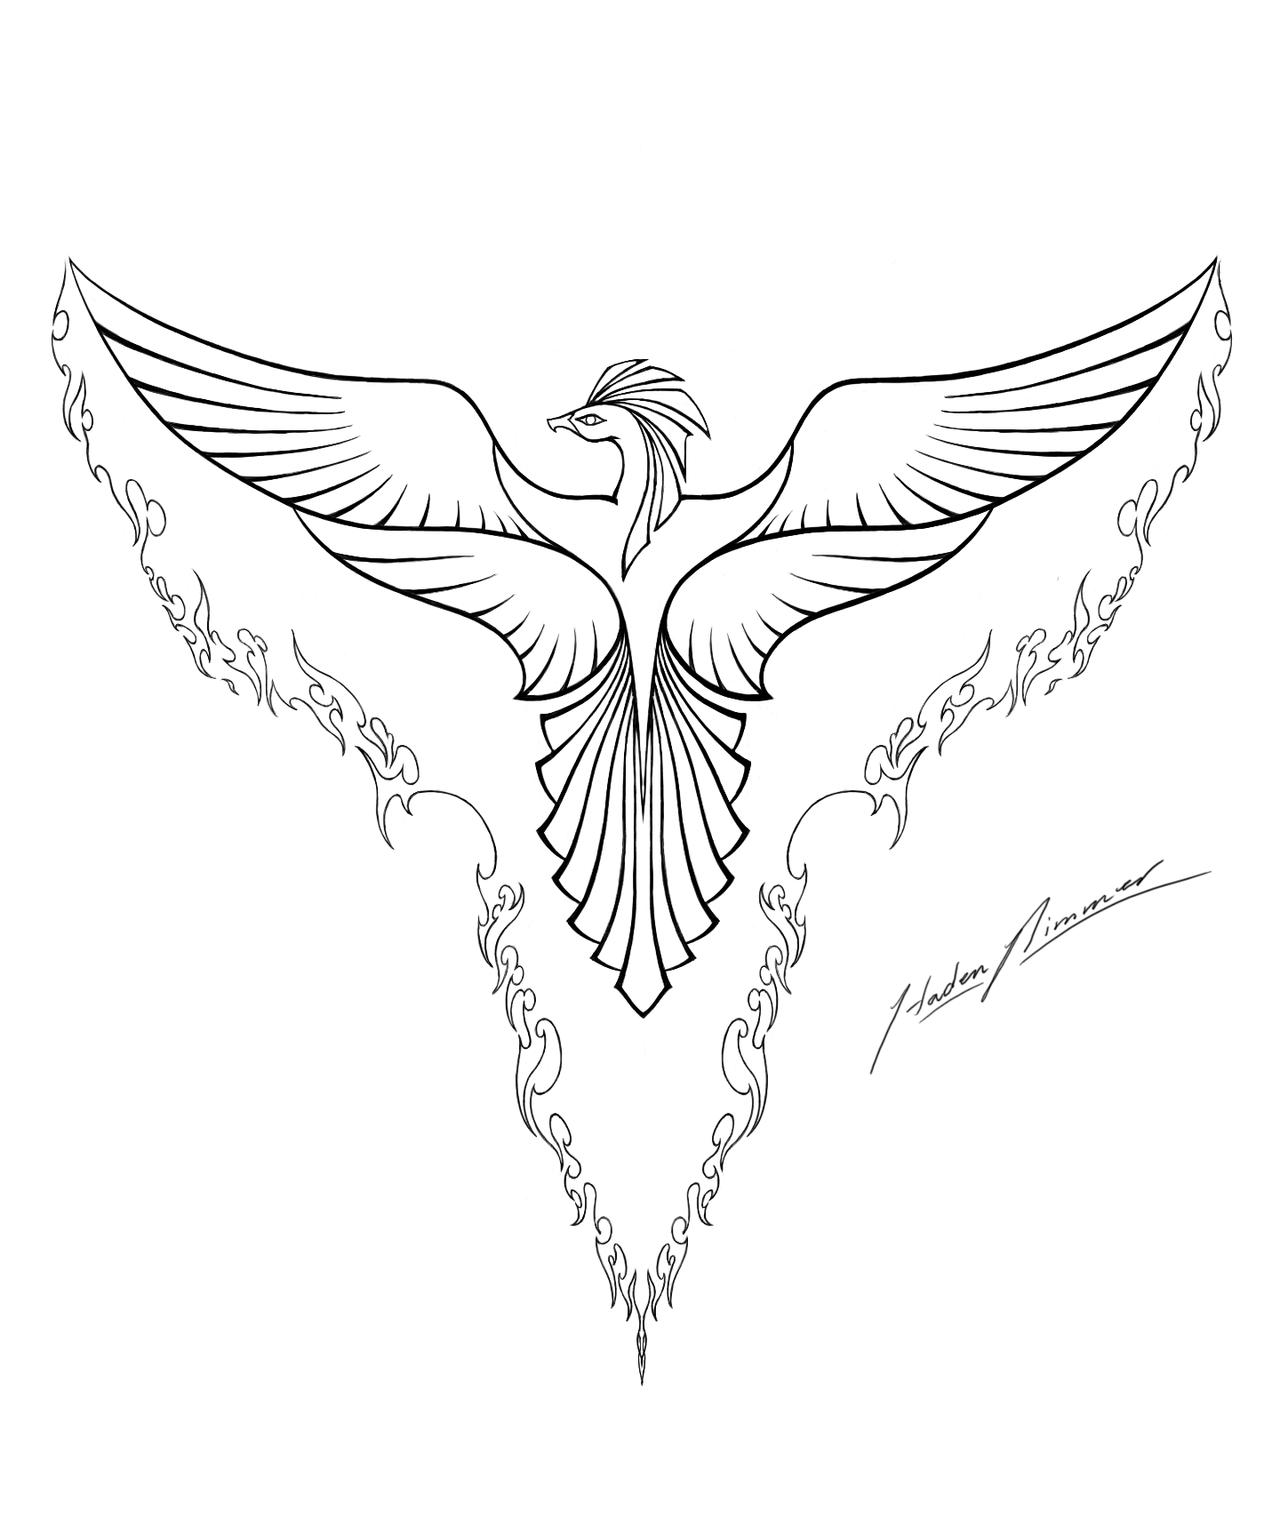 Phoenix Sketch February 28 2011 Colouring Line Art Phoenix Tattoo Phoenix Tattoo Design Phoenix Bird Tattoos